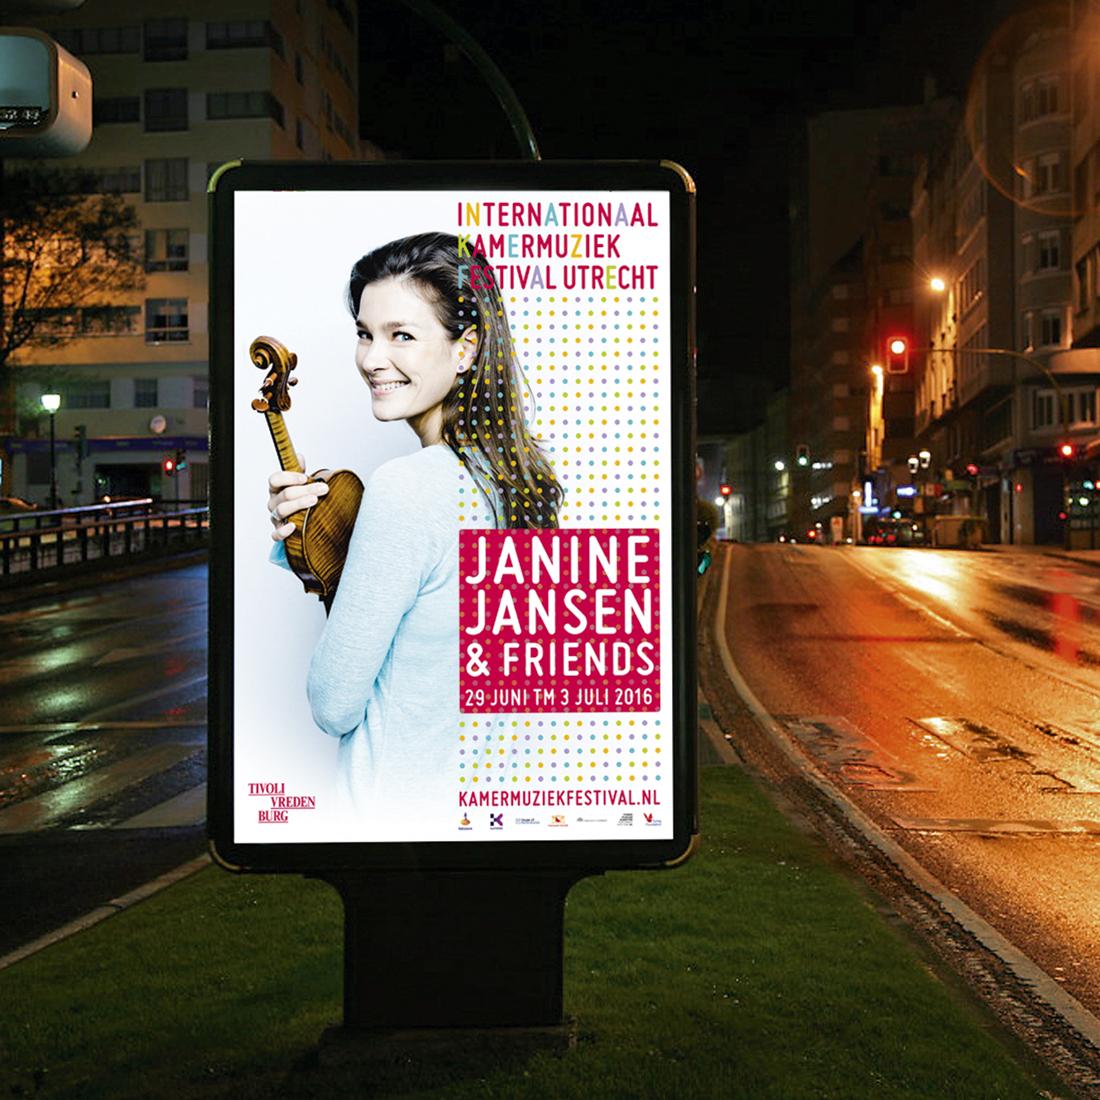 Janine Jansen & Friends